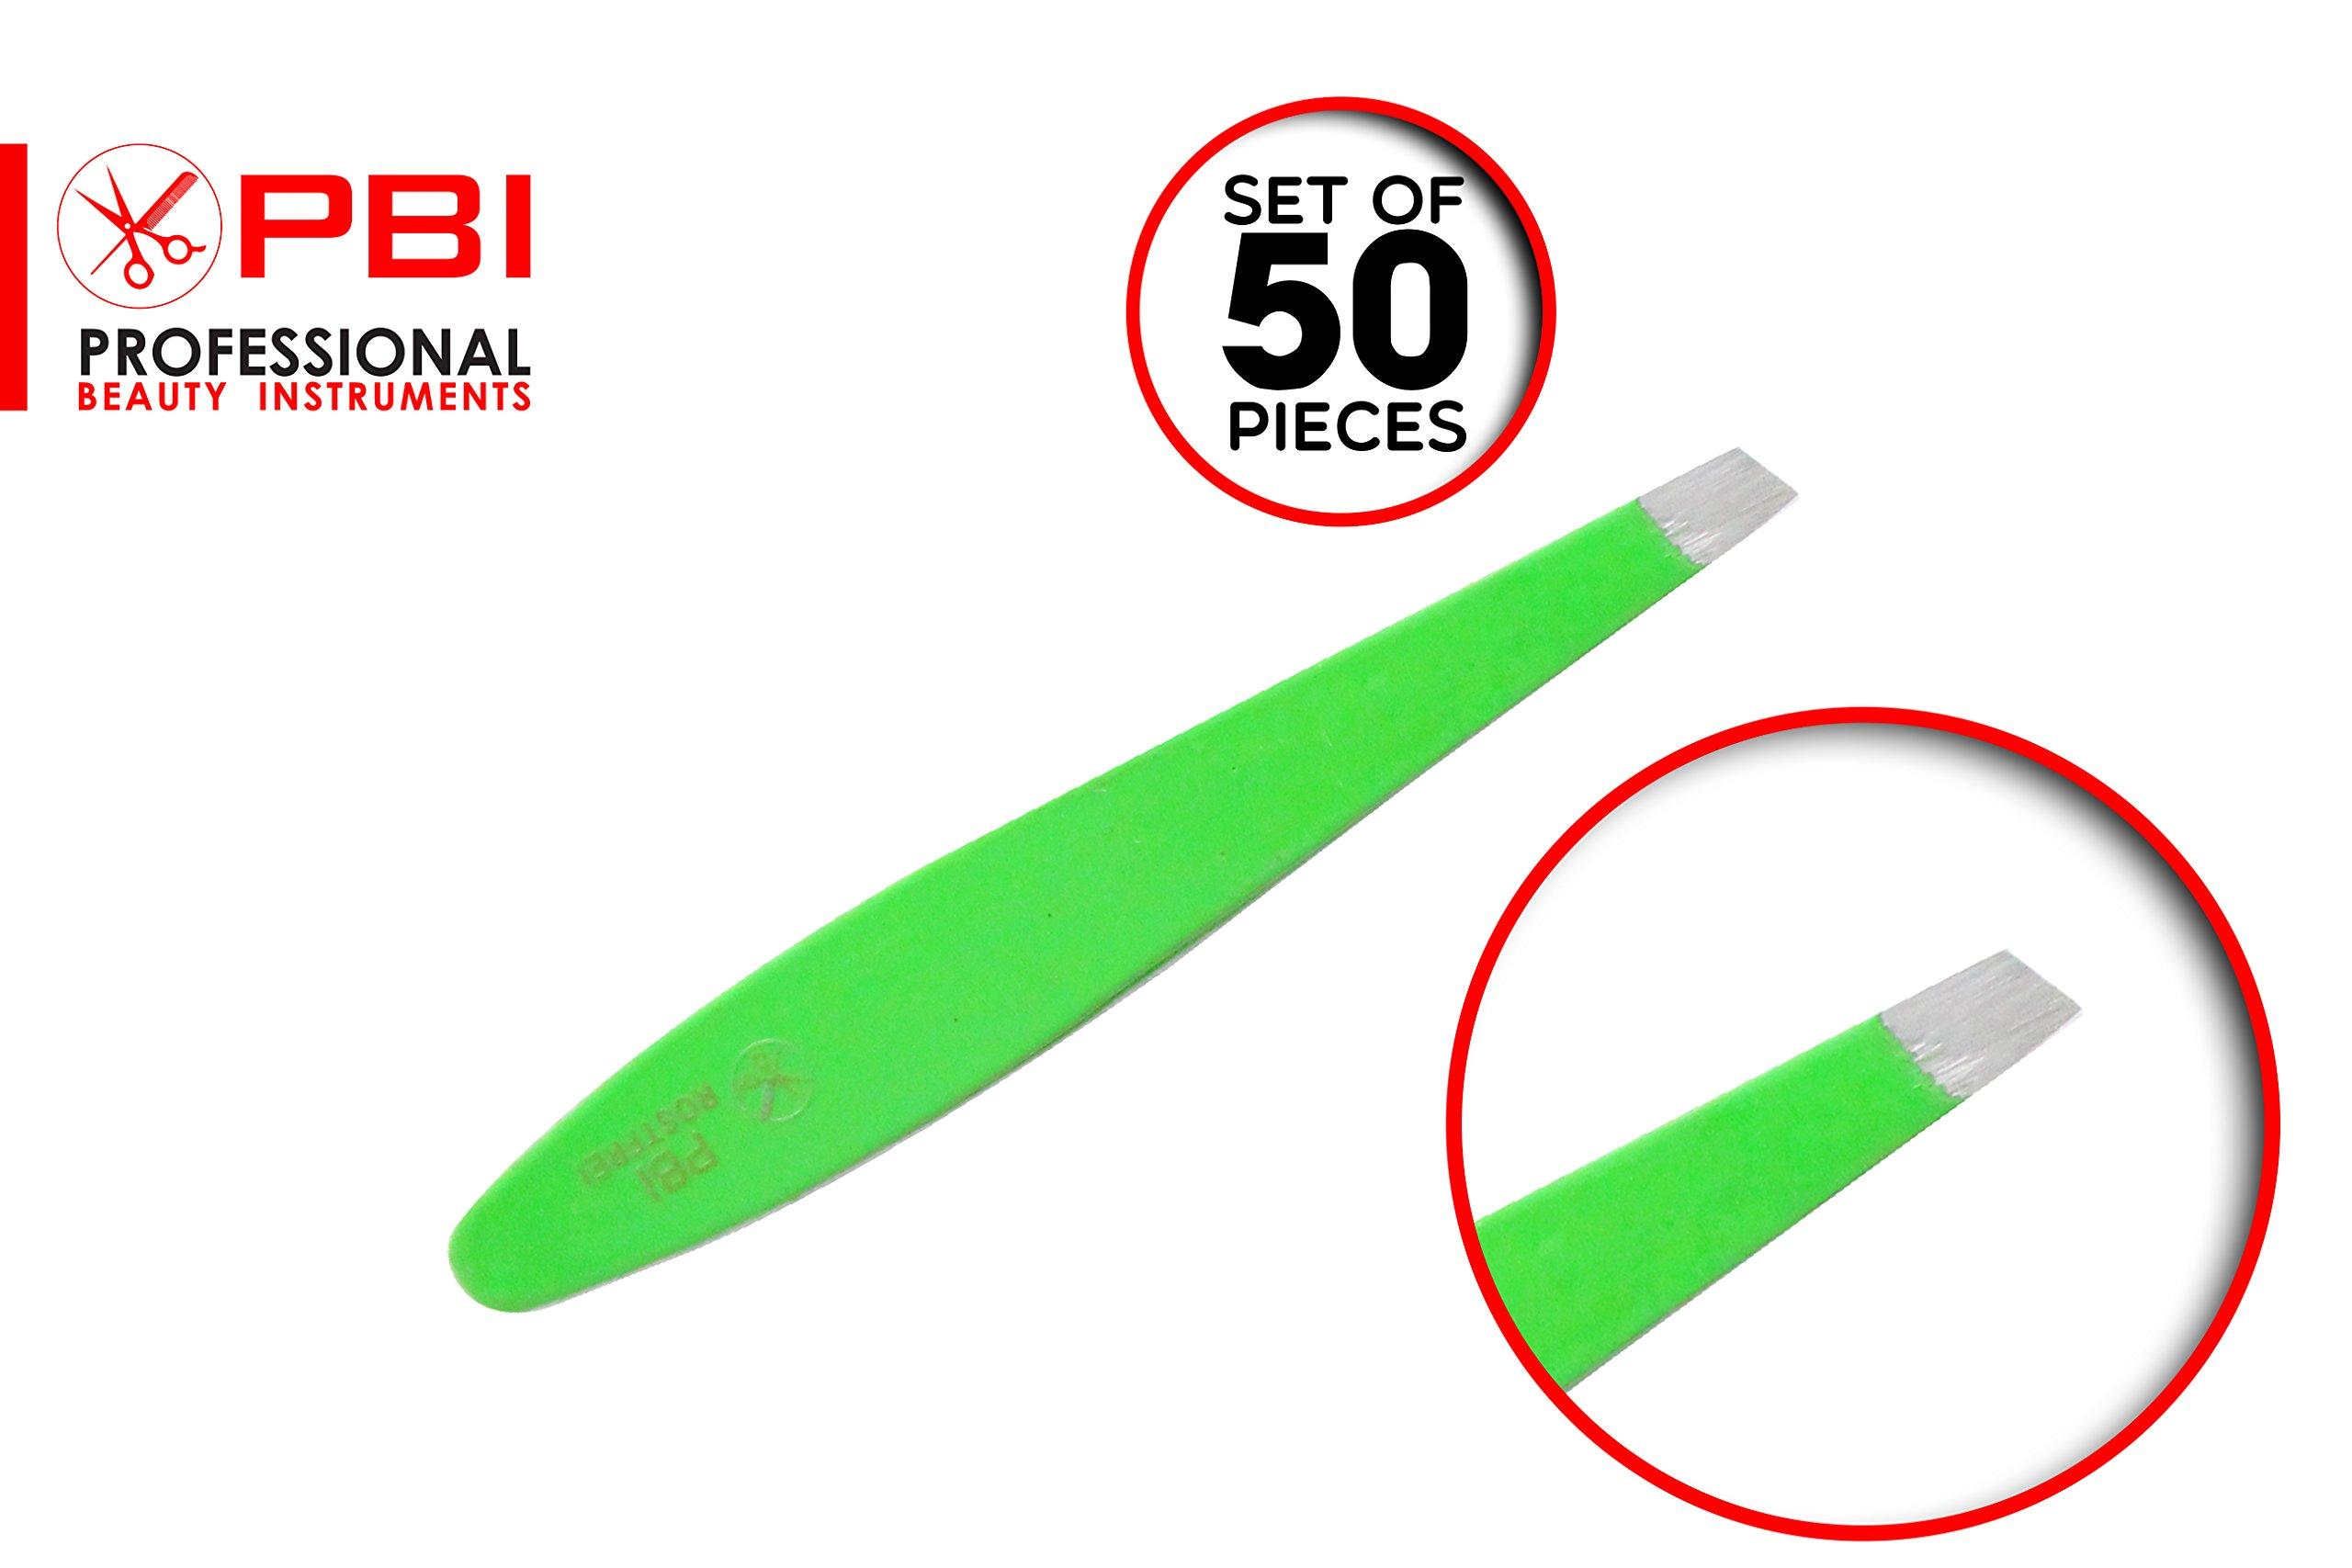 Eyebrows tweezer - hair plucker - hair depletion tweezer - eyelash extension placer - Green Color tweezers - 6.7 cm - 50 pieces set - Stainless steel from PBI